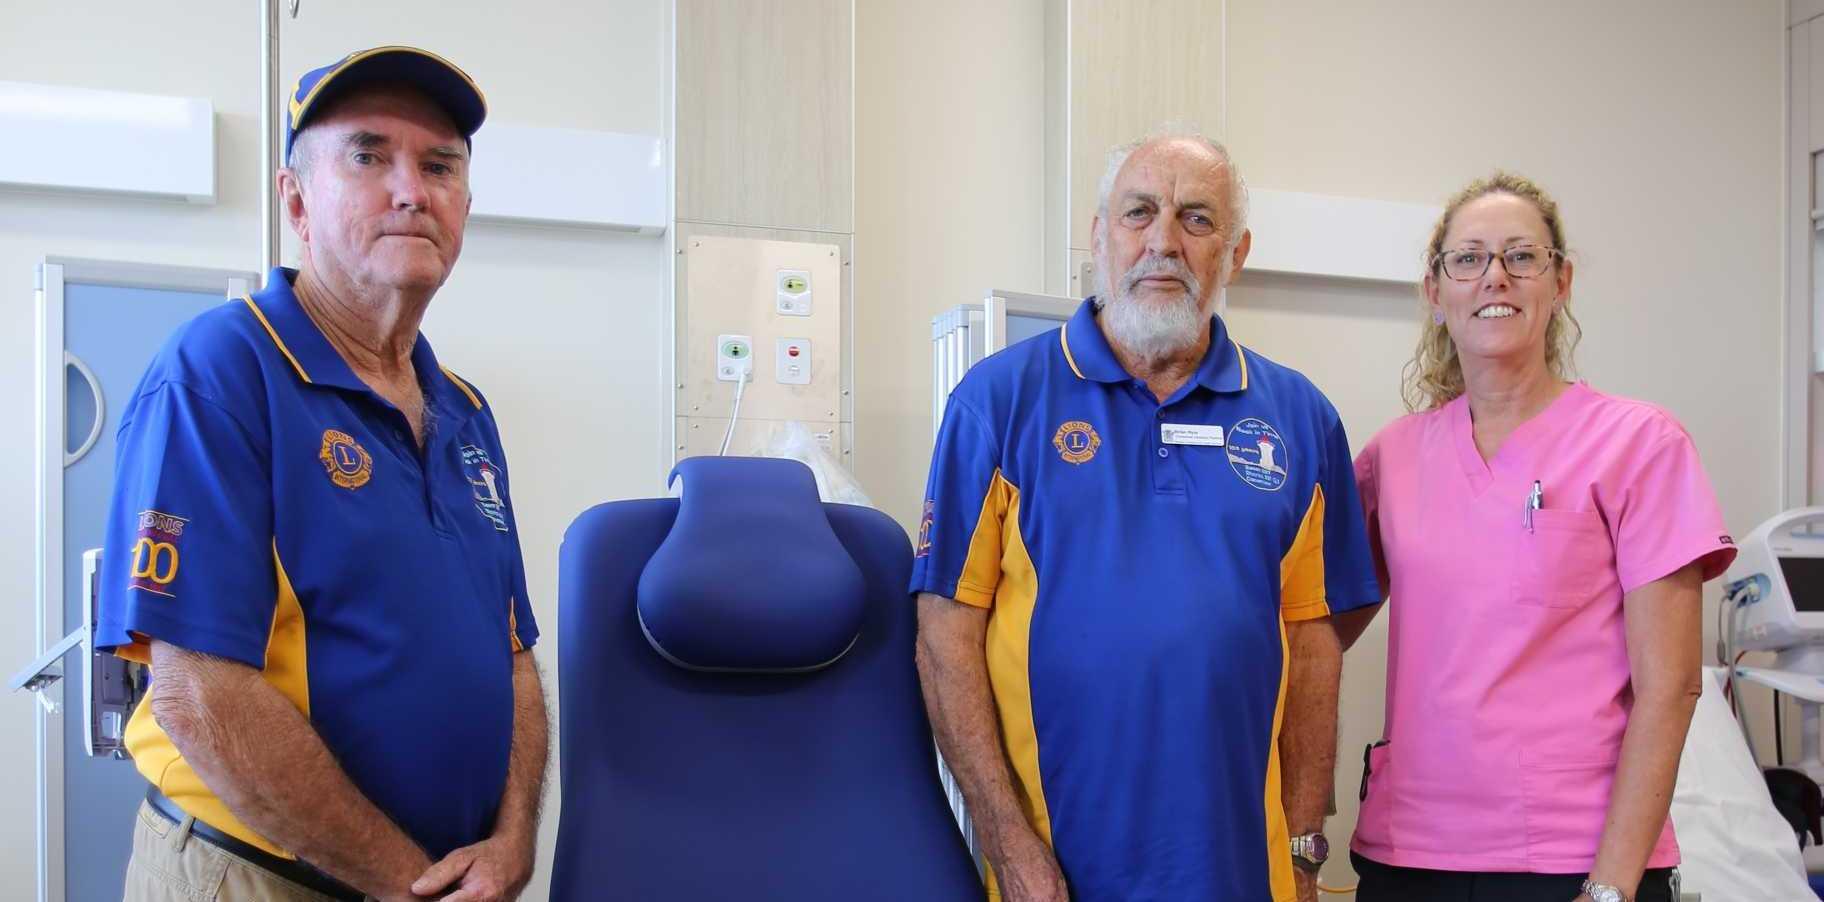 SIT DOWN: Bowen Lions Club member Peter Goodman, oncology nurse Jay Doig and Bowen Lions Club vice-president Brian Ryles.